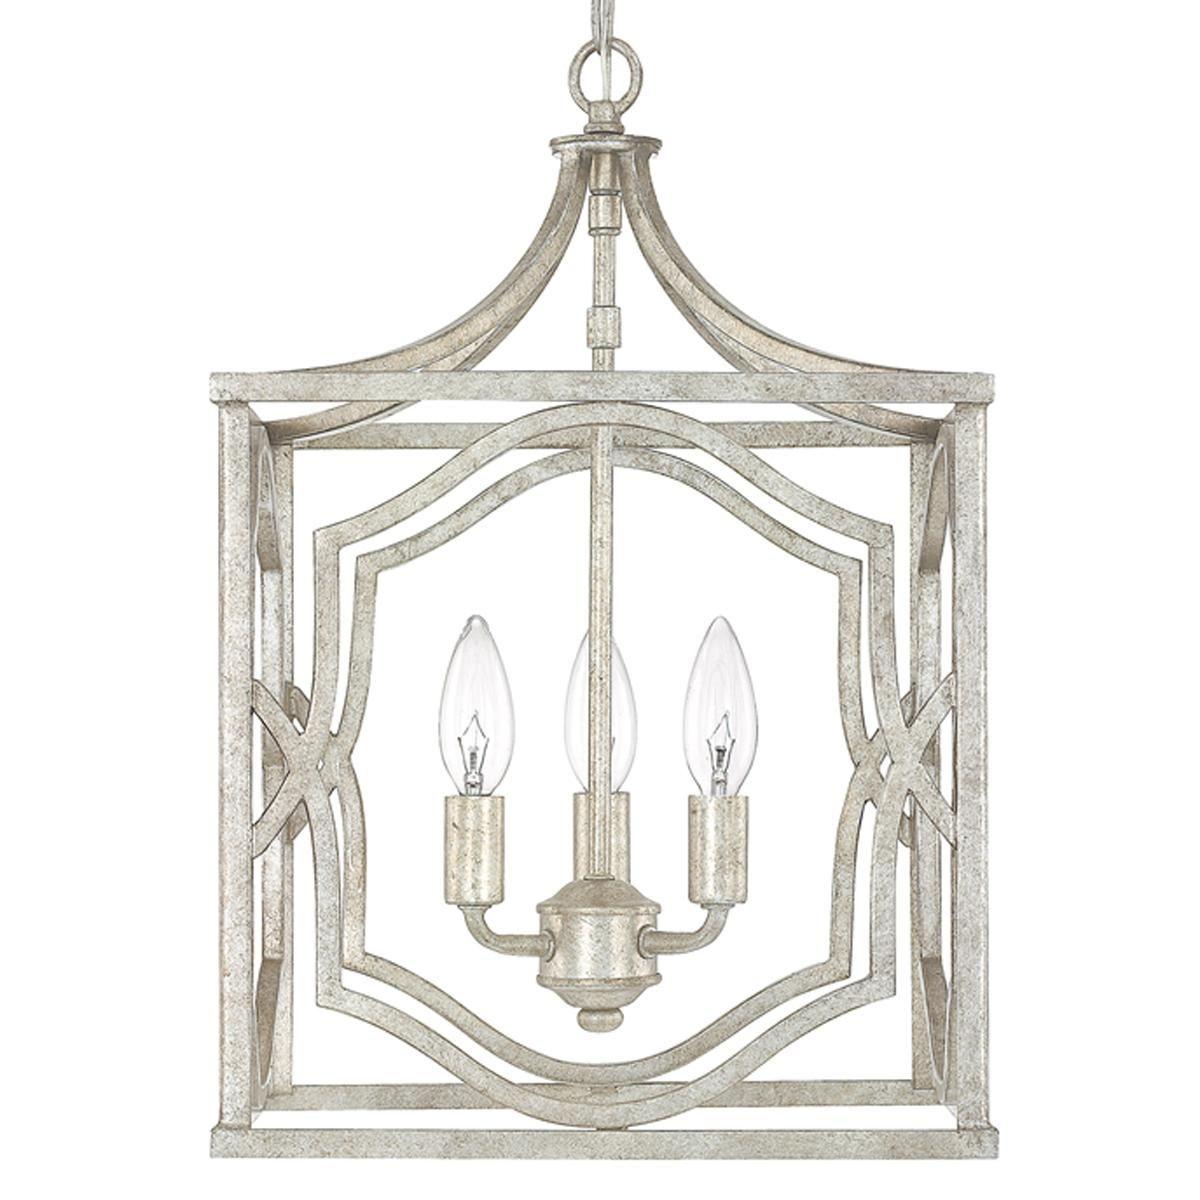 Modern Fretwork Frame Lantern Small Lantern Pendant